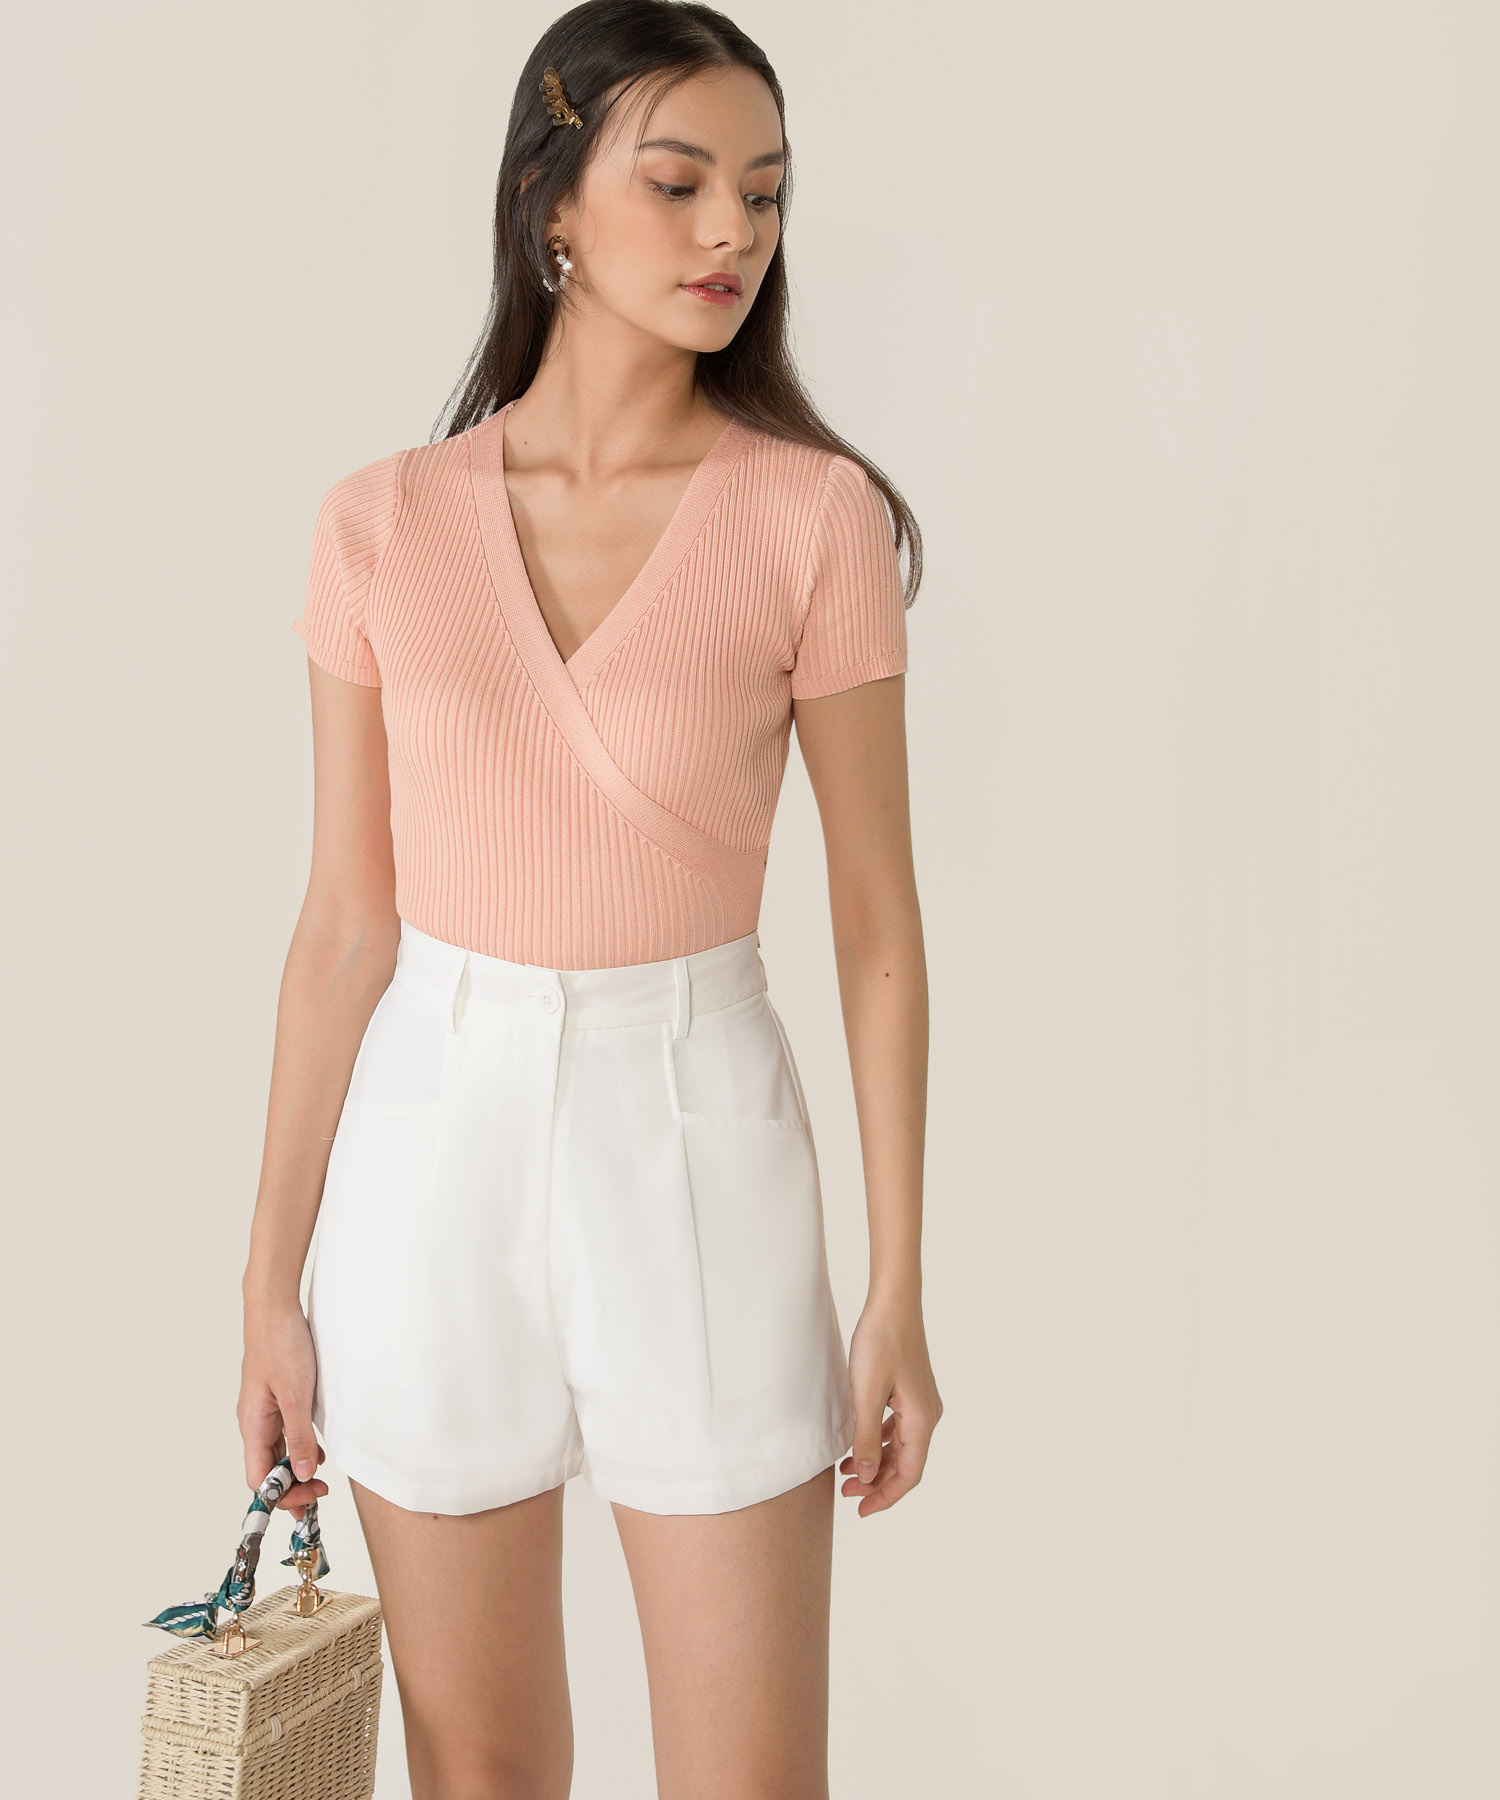 devon-knit-overlay-cropped-top-venetian-pink-1